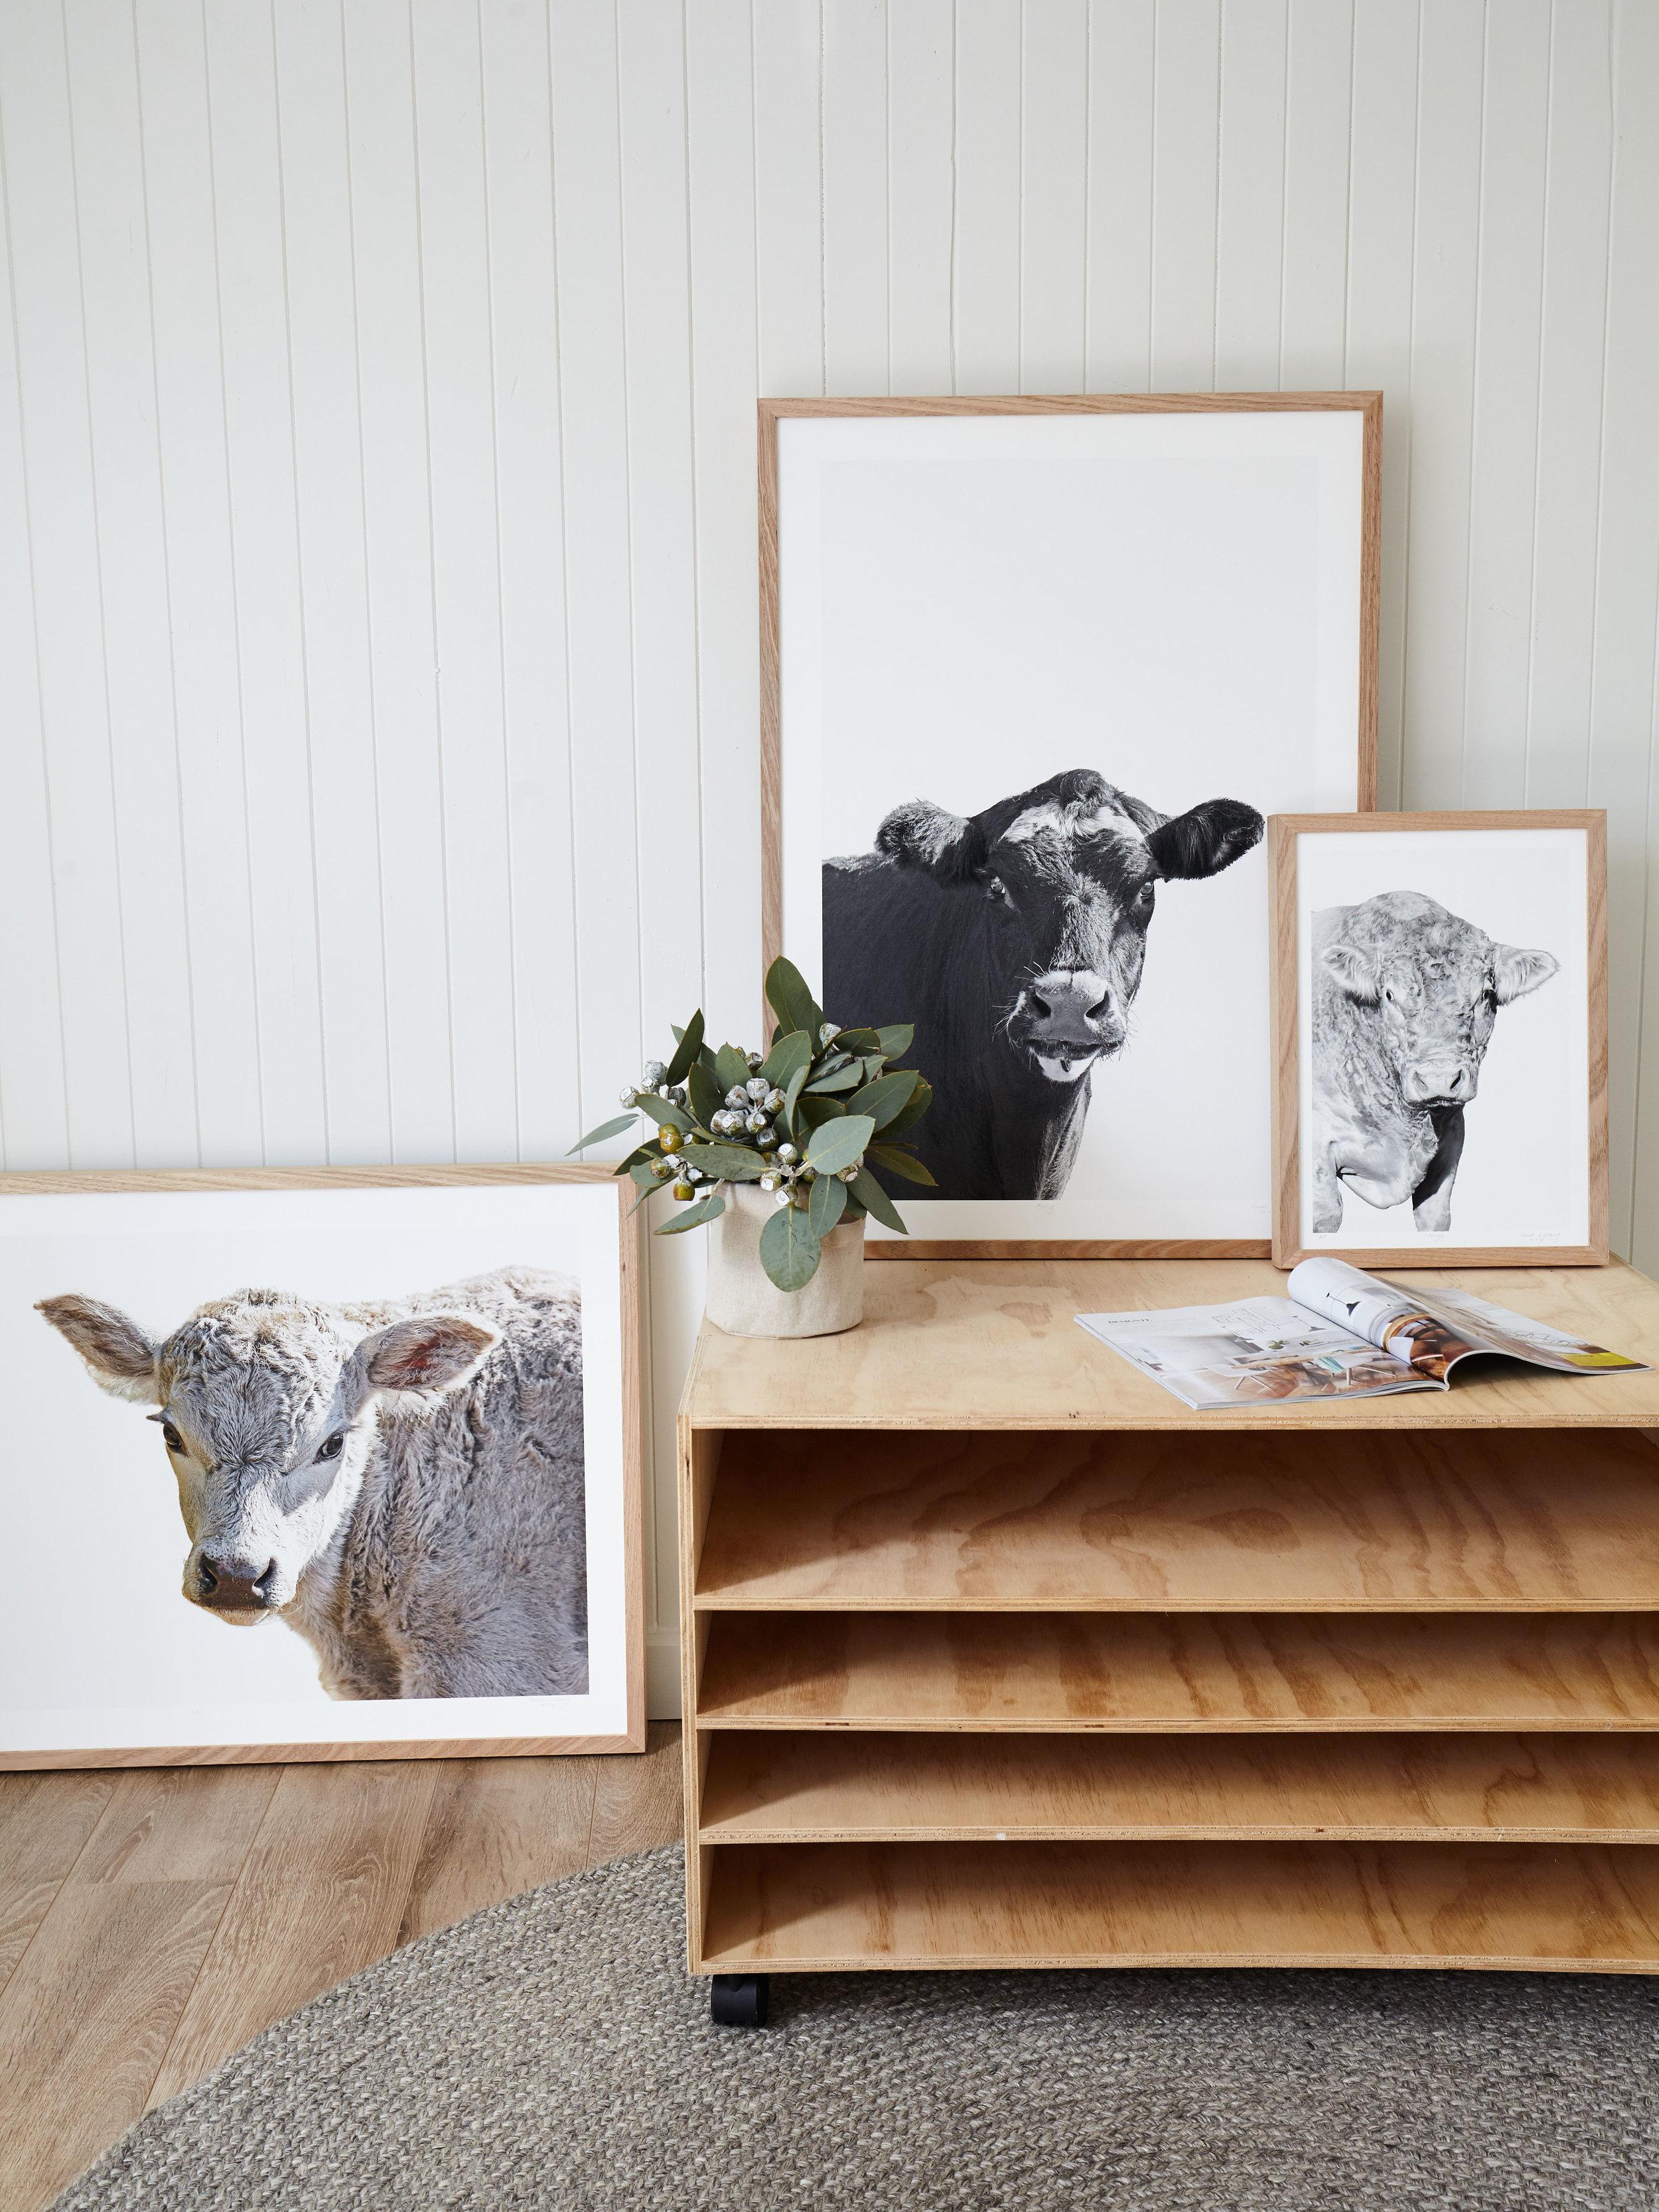 Maitland Street Interiors, Sarah Elshaug, Interior Stylist Melbourne, Elsie + Hugo, Limited Edition Artwork, Cow Prints